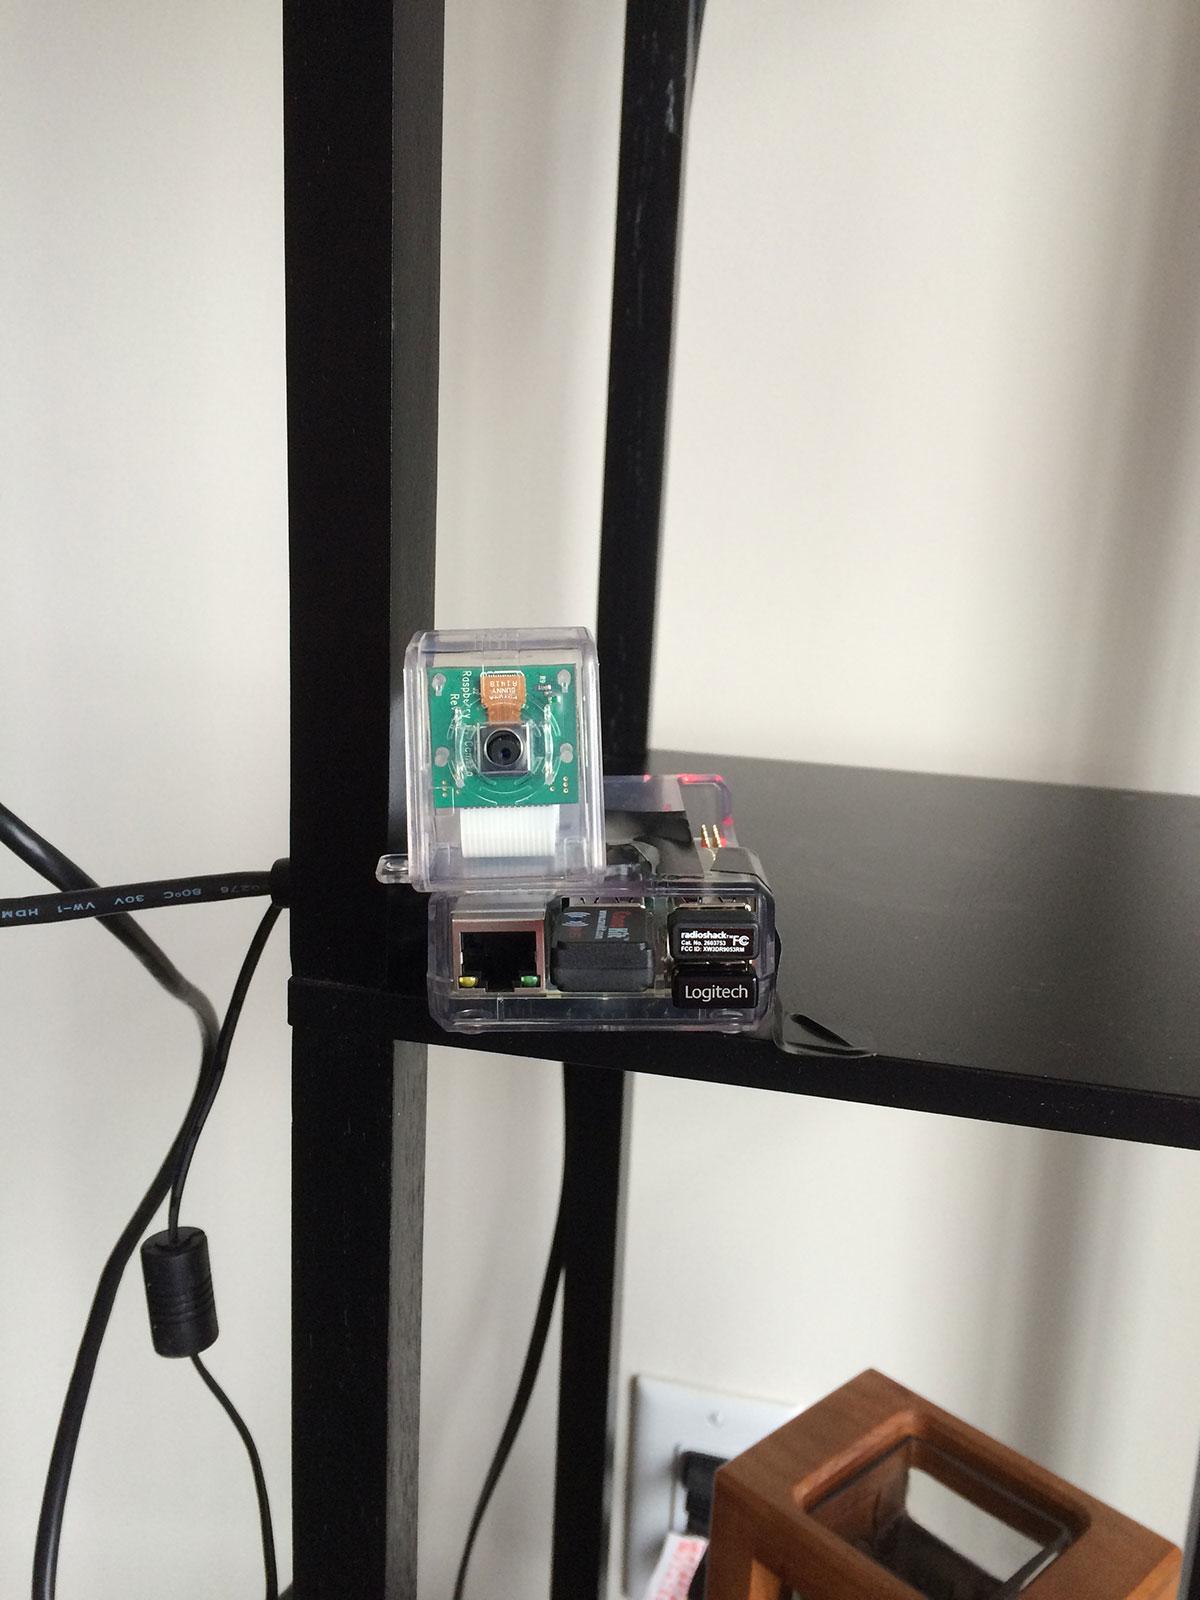 Figure 3: Example setup of my Raspberry Pi 2 and camera.